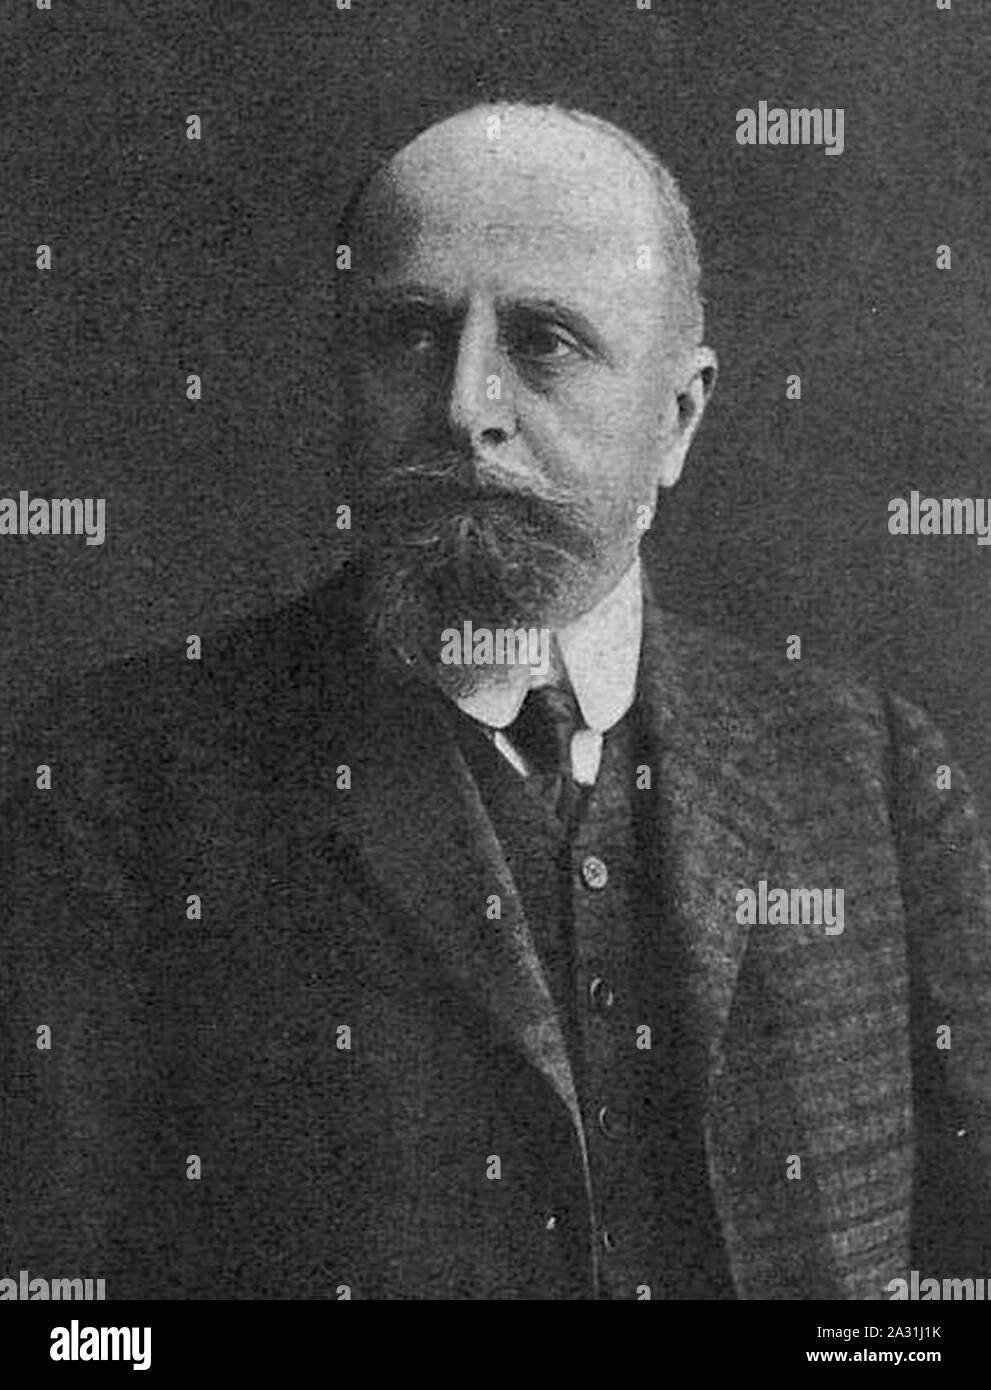 Eristov Andrey Mikhailovich. Stock Photo